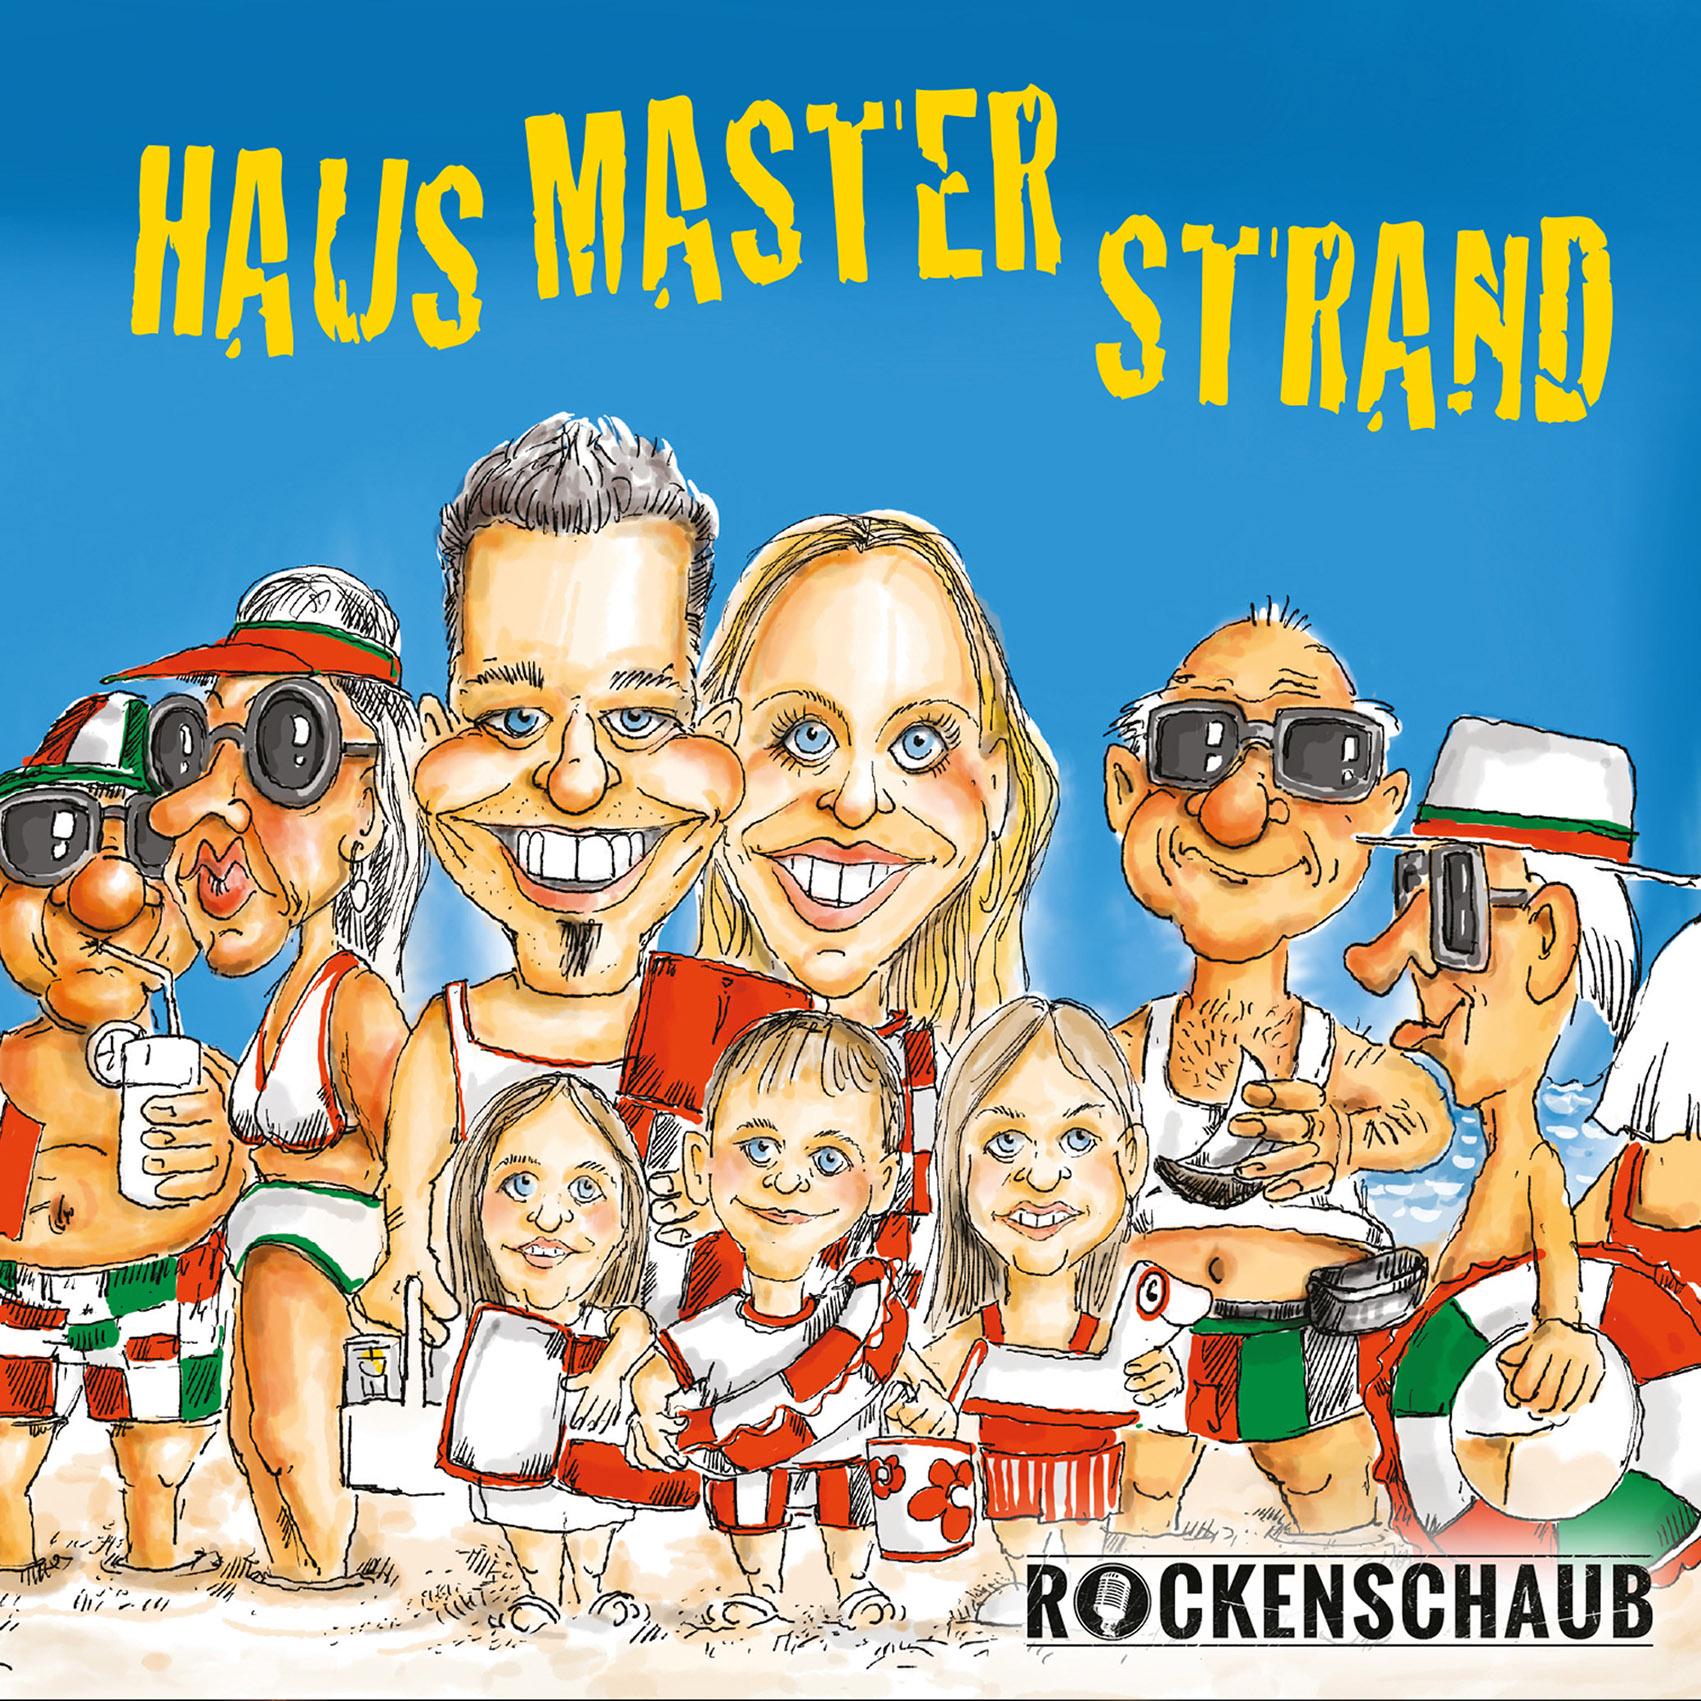 Hausmasterstrand (Offizielles Video)